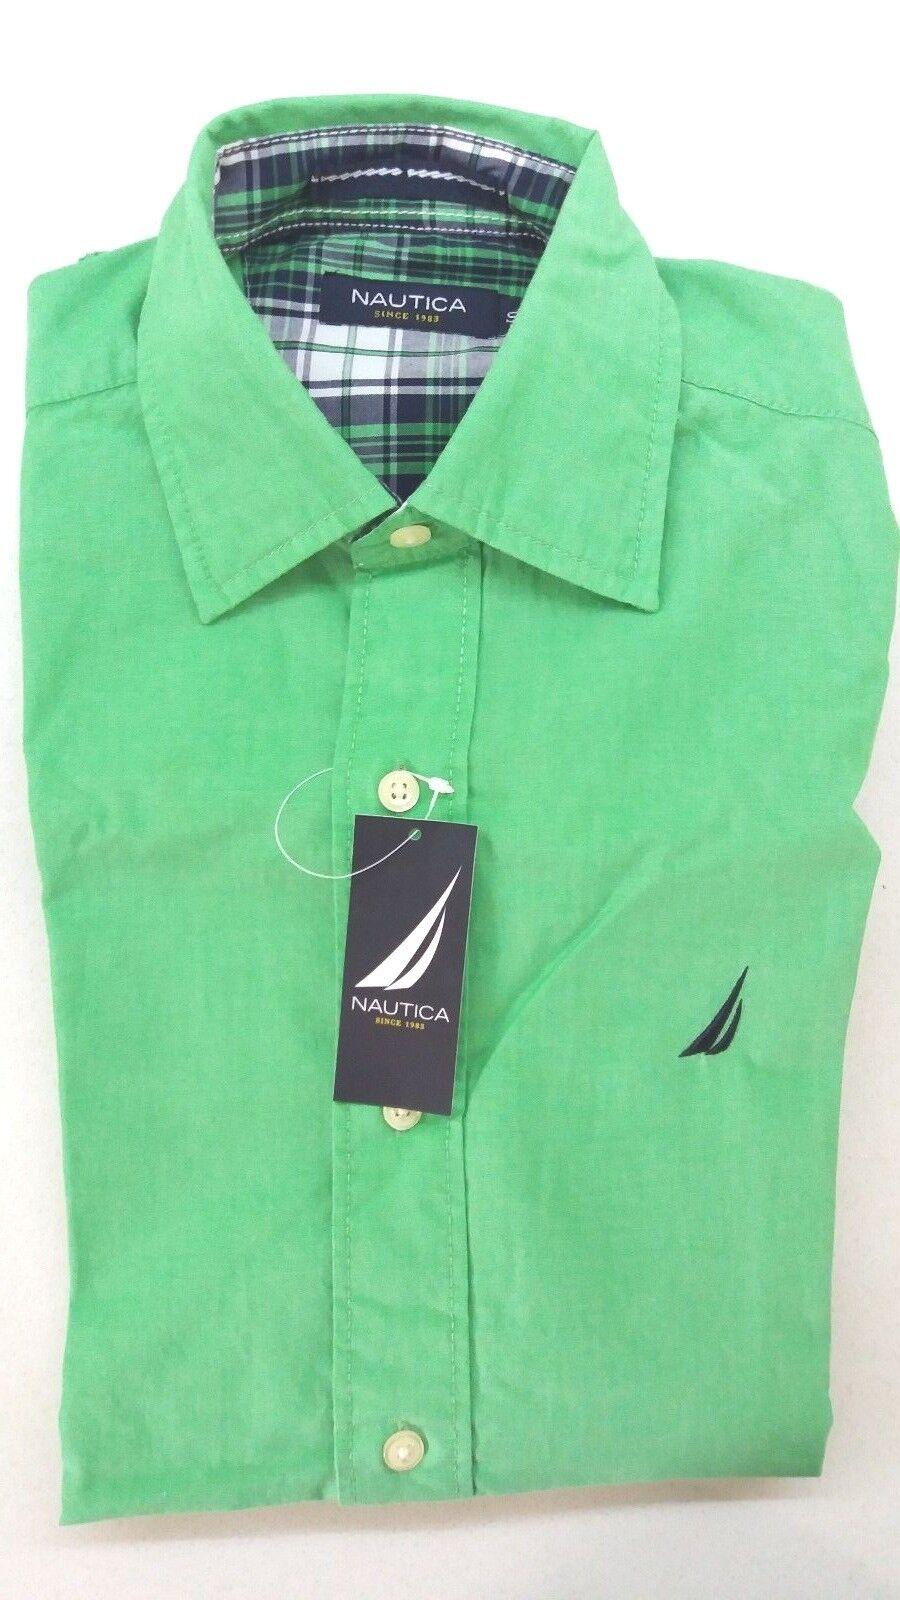 NAUTICA Men's Slim Fit Stripe Long Sleeve Shirt  color Green Size- S